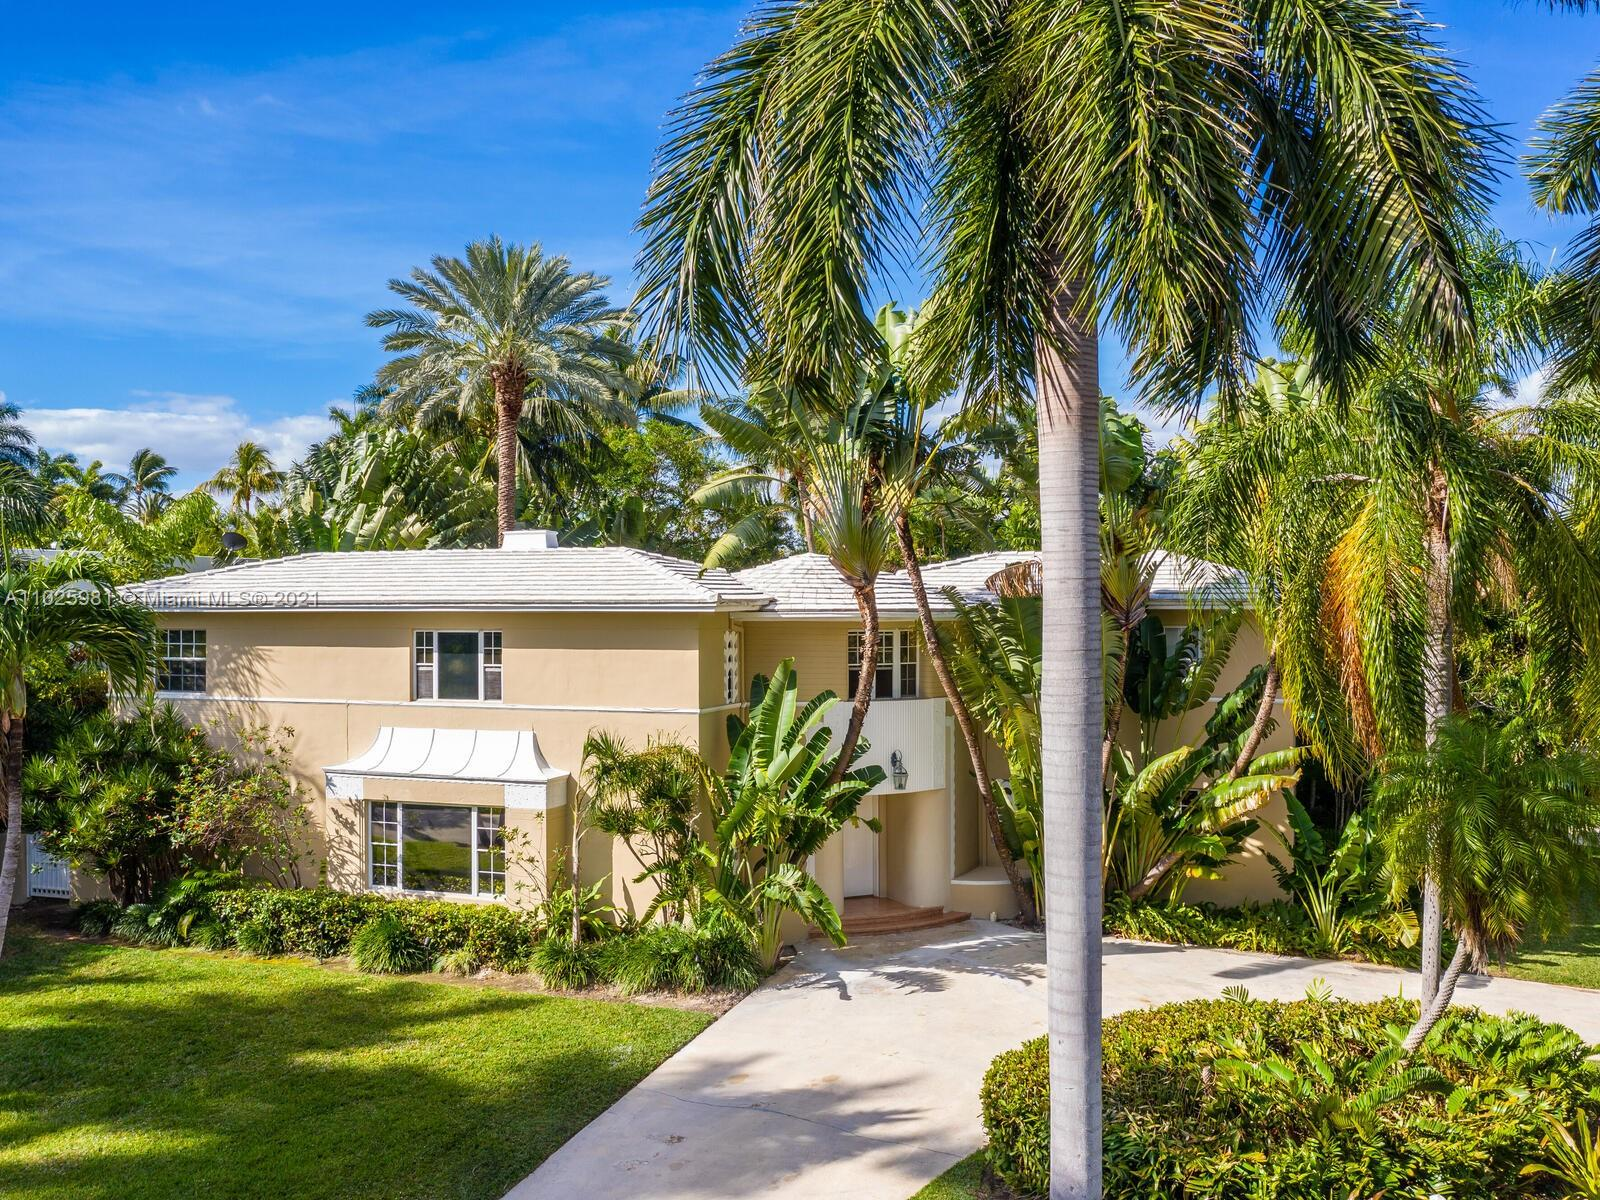 2560 Sunset Dr, Miami Beach, Florida 33140